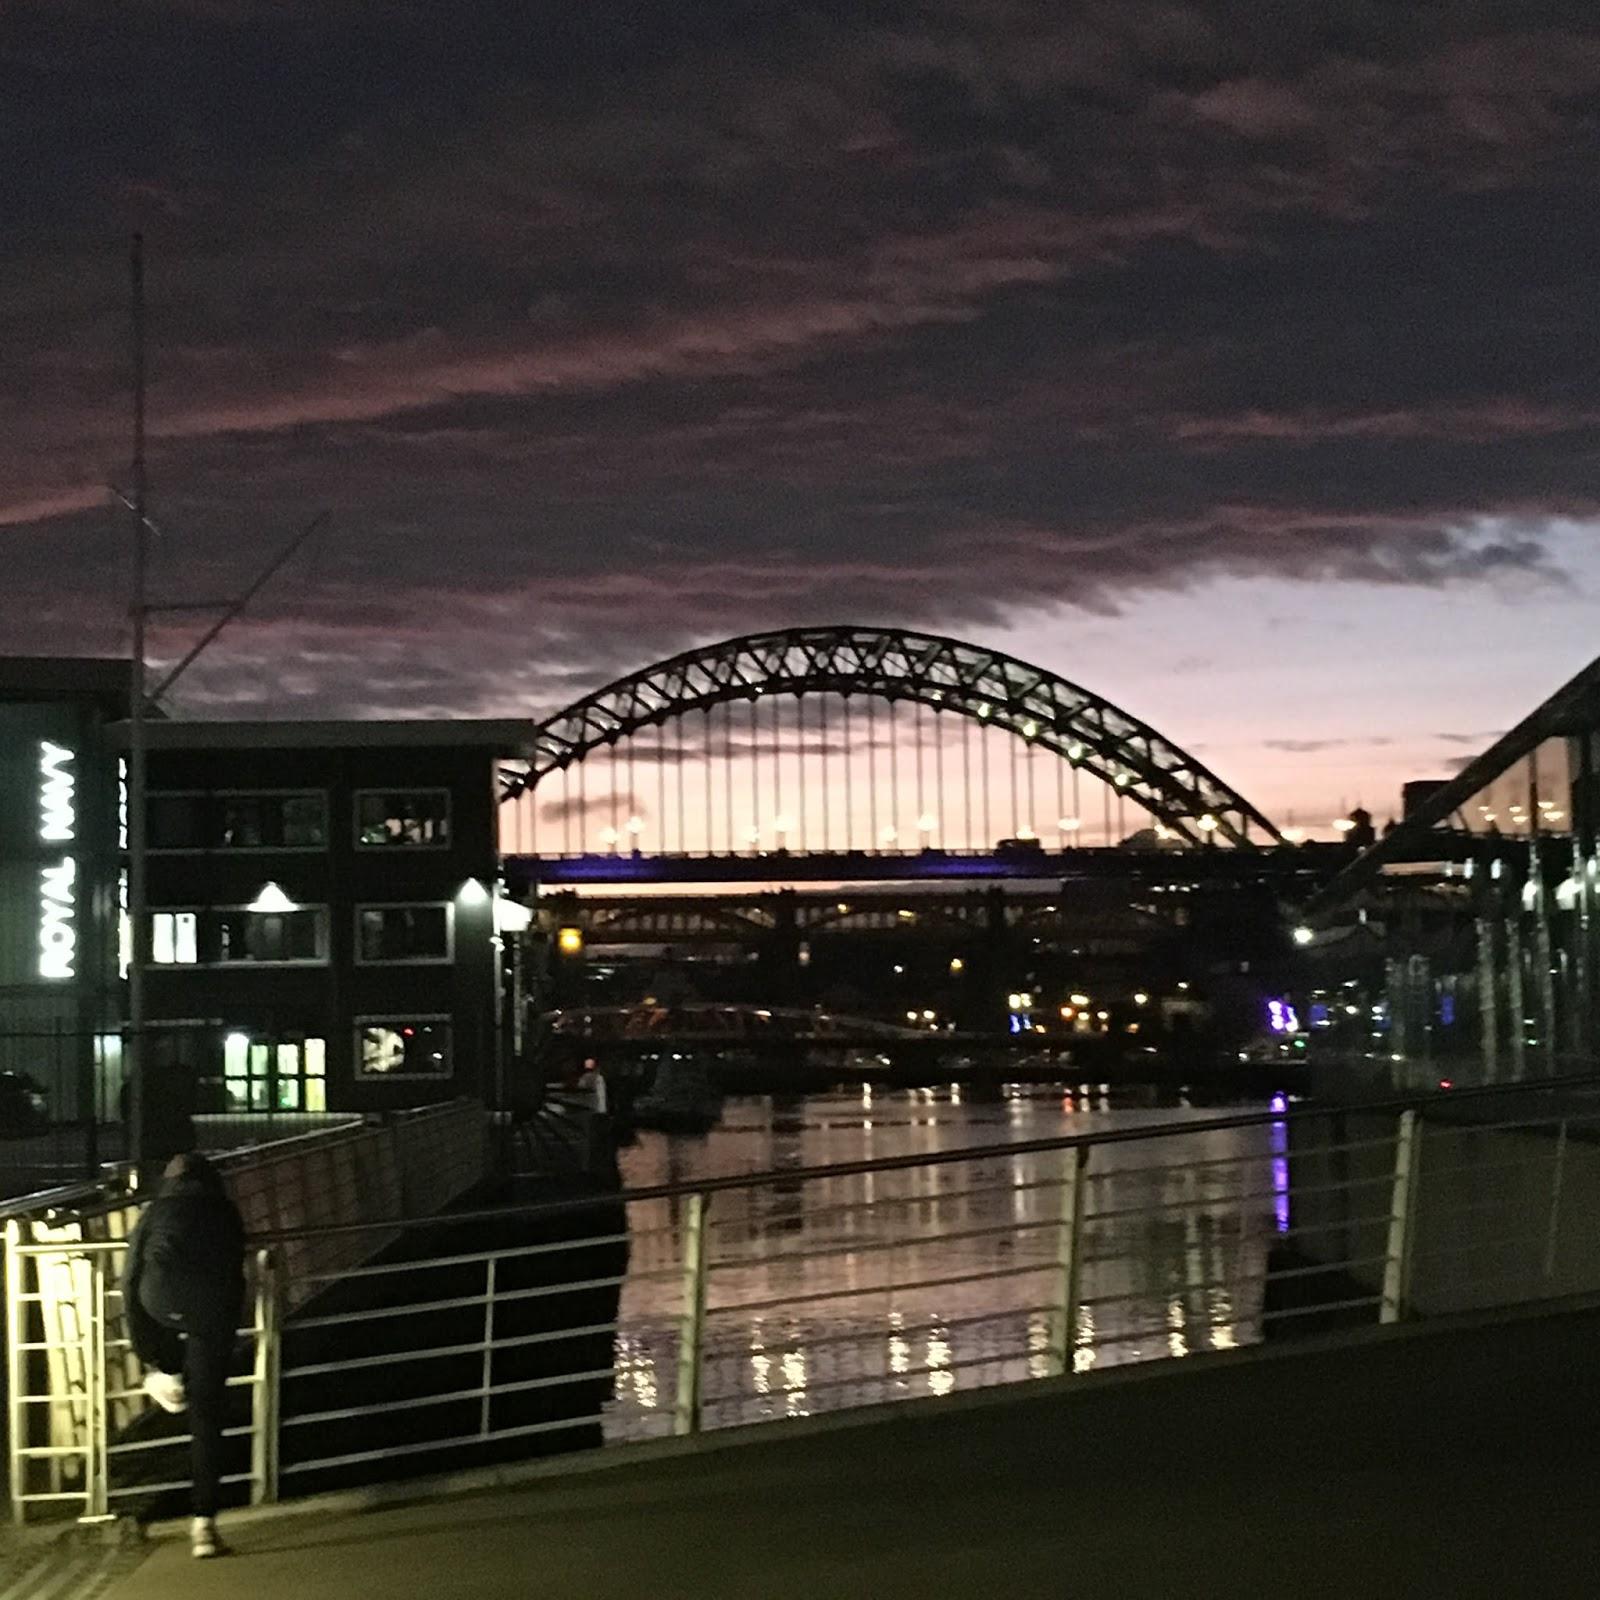 Weekend in Tynemouth, Newcastle, Tyne Bridge at Sunset